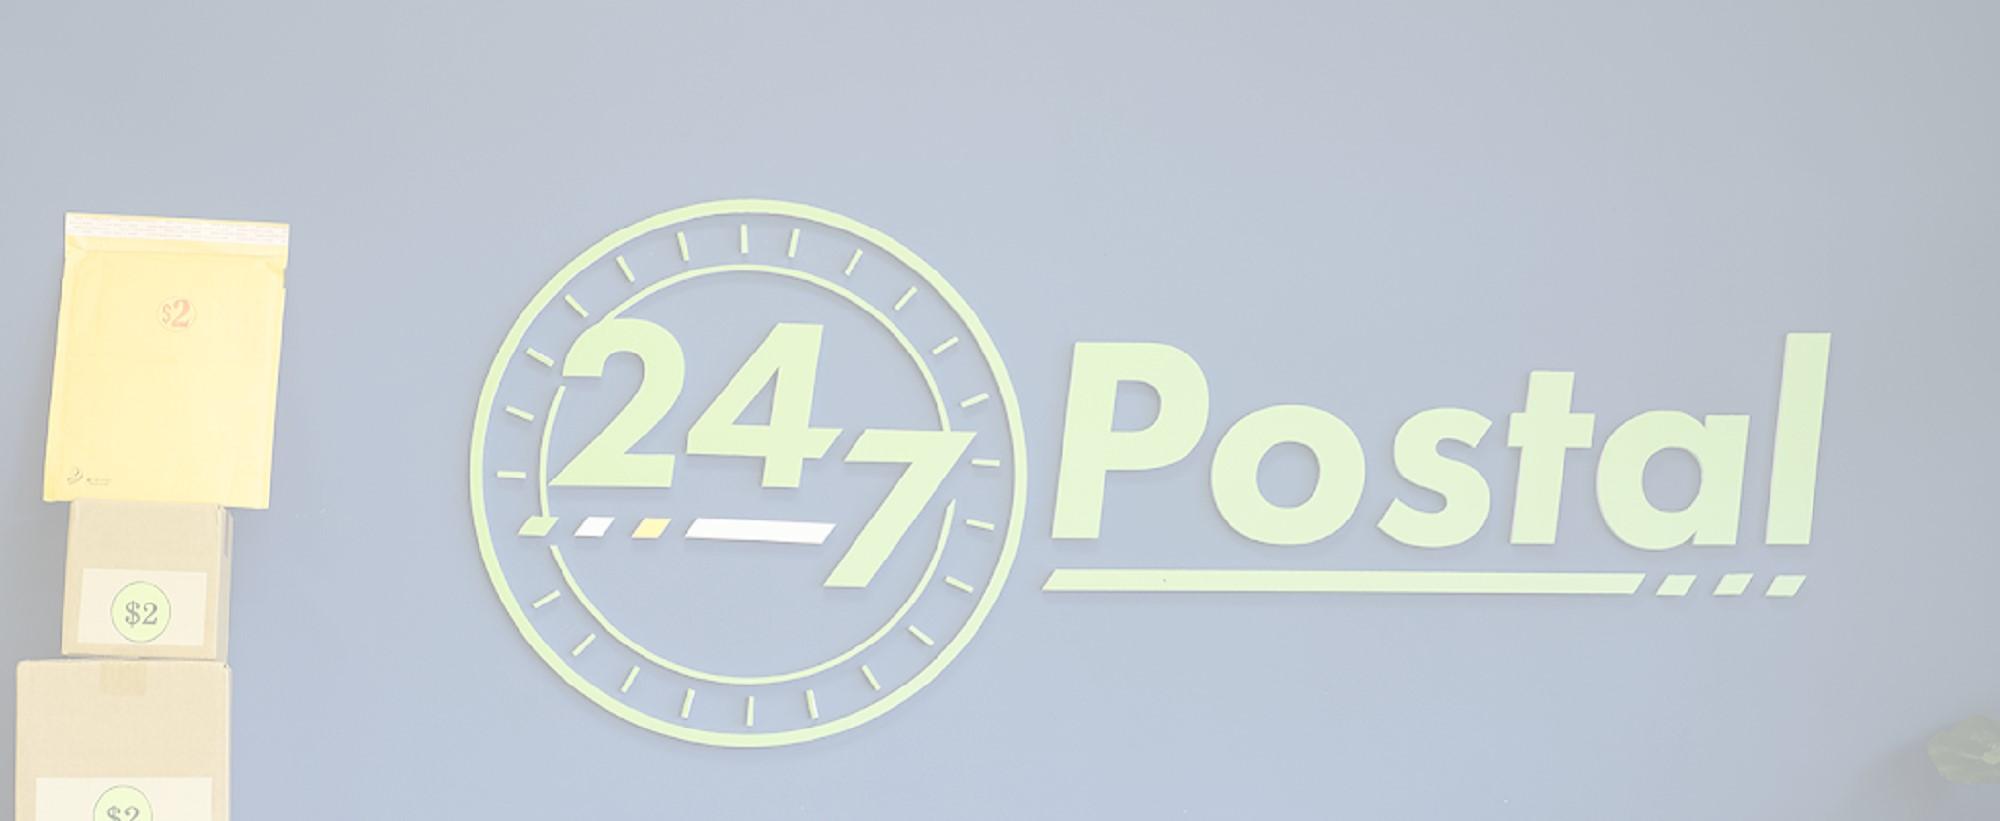 24-7 Postal Services; Success Stories